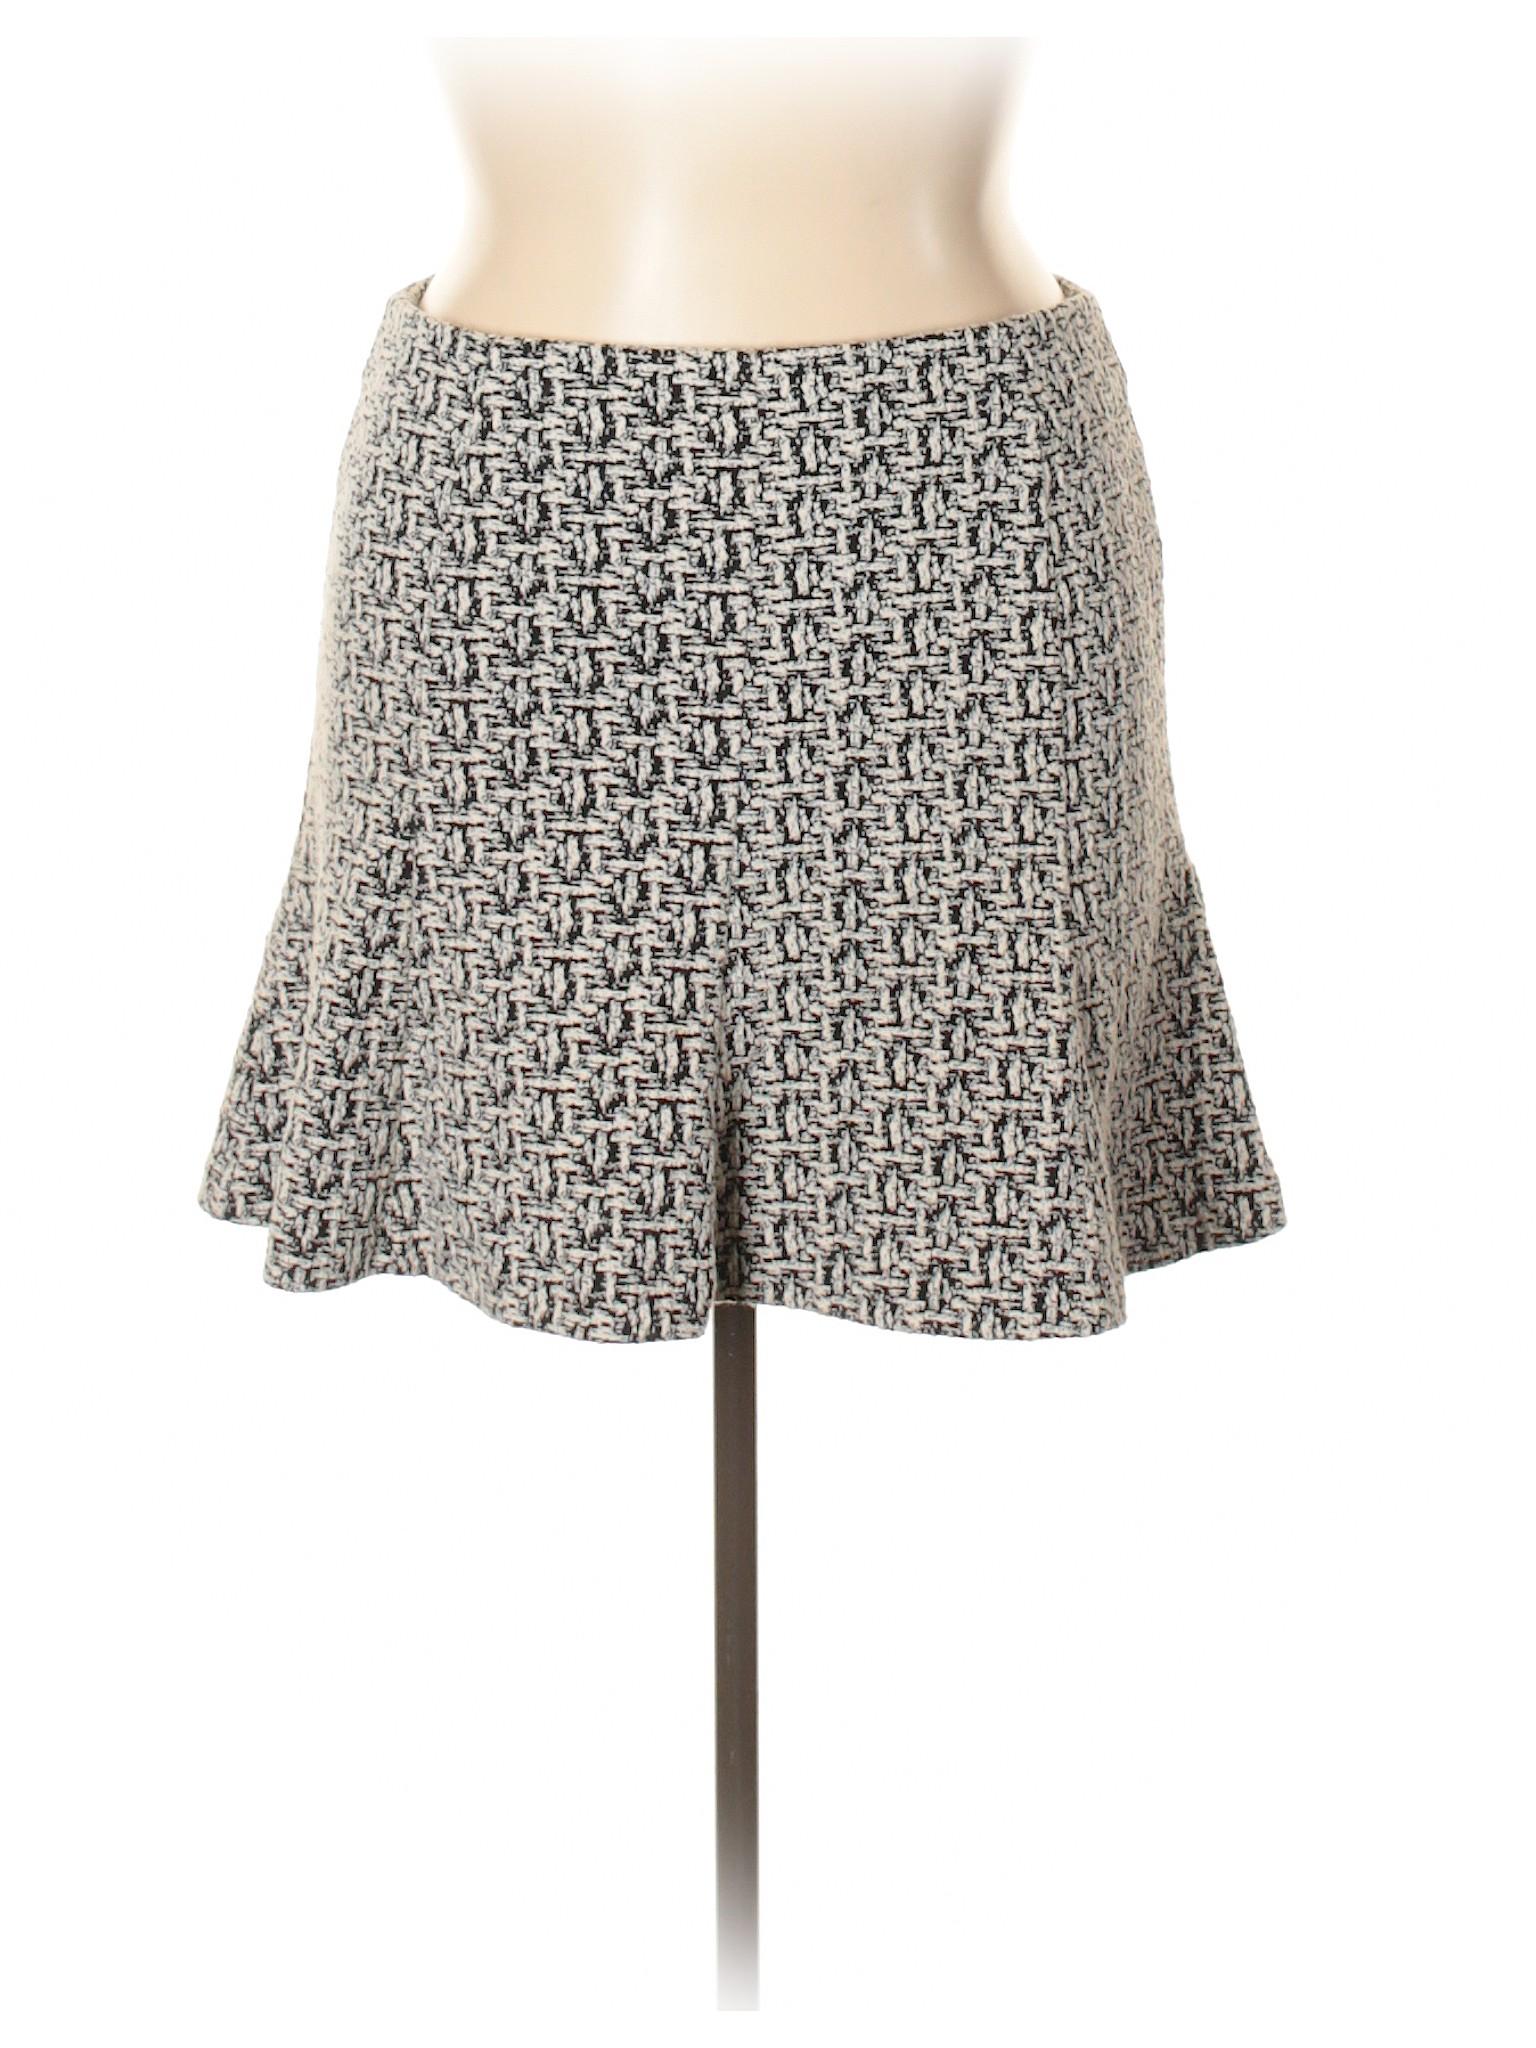 Banana Republic winter Store Casual Skirt Factory Leisure aTRpOxBx